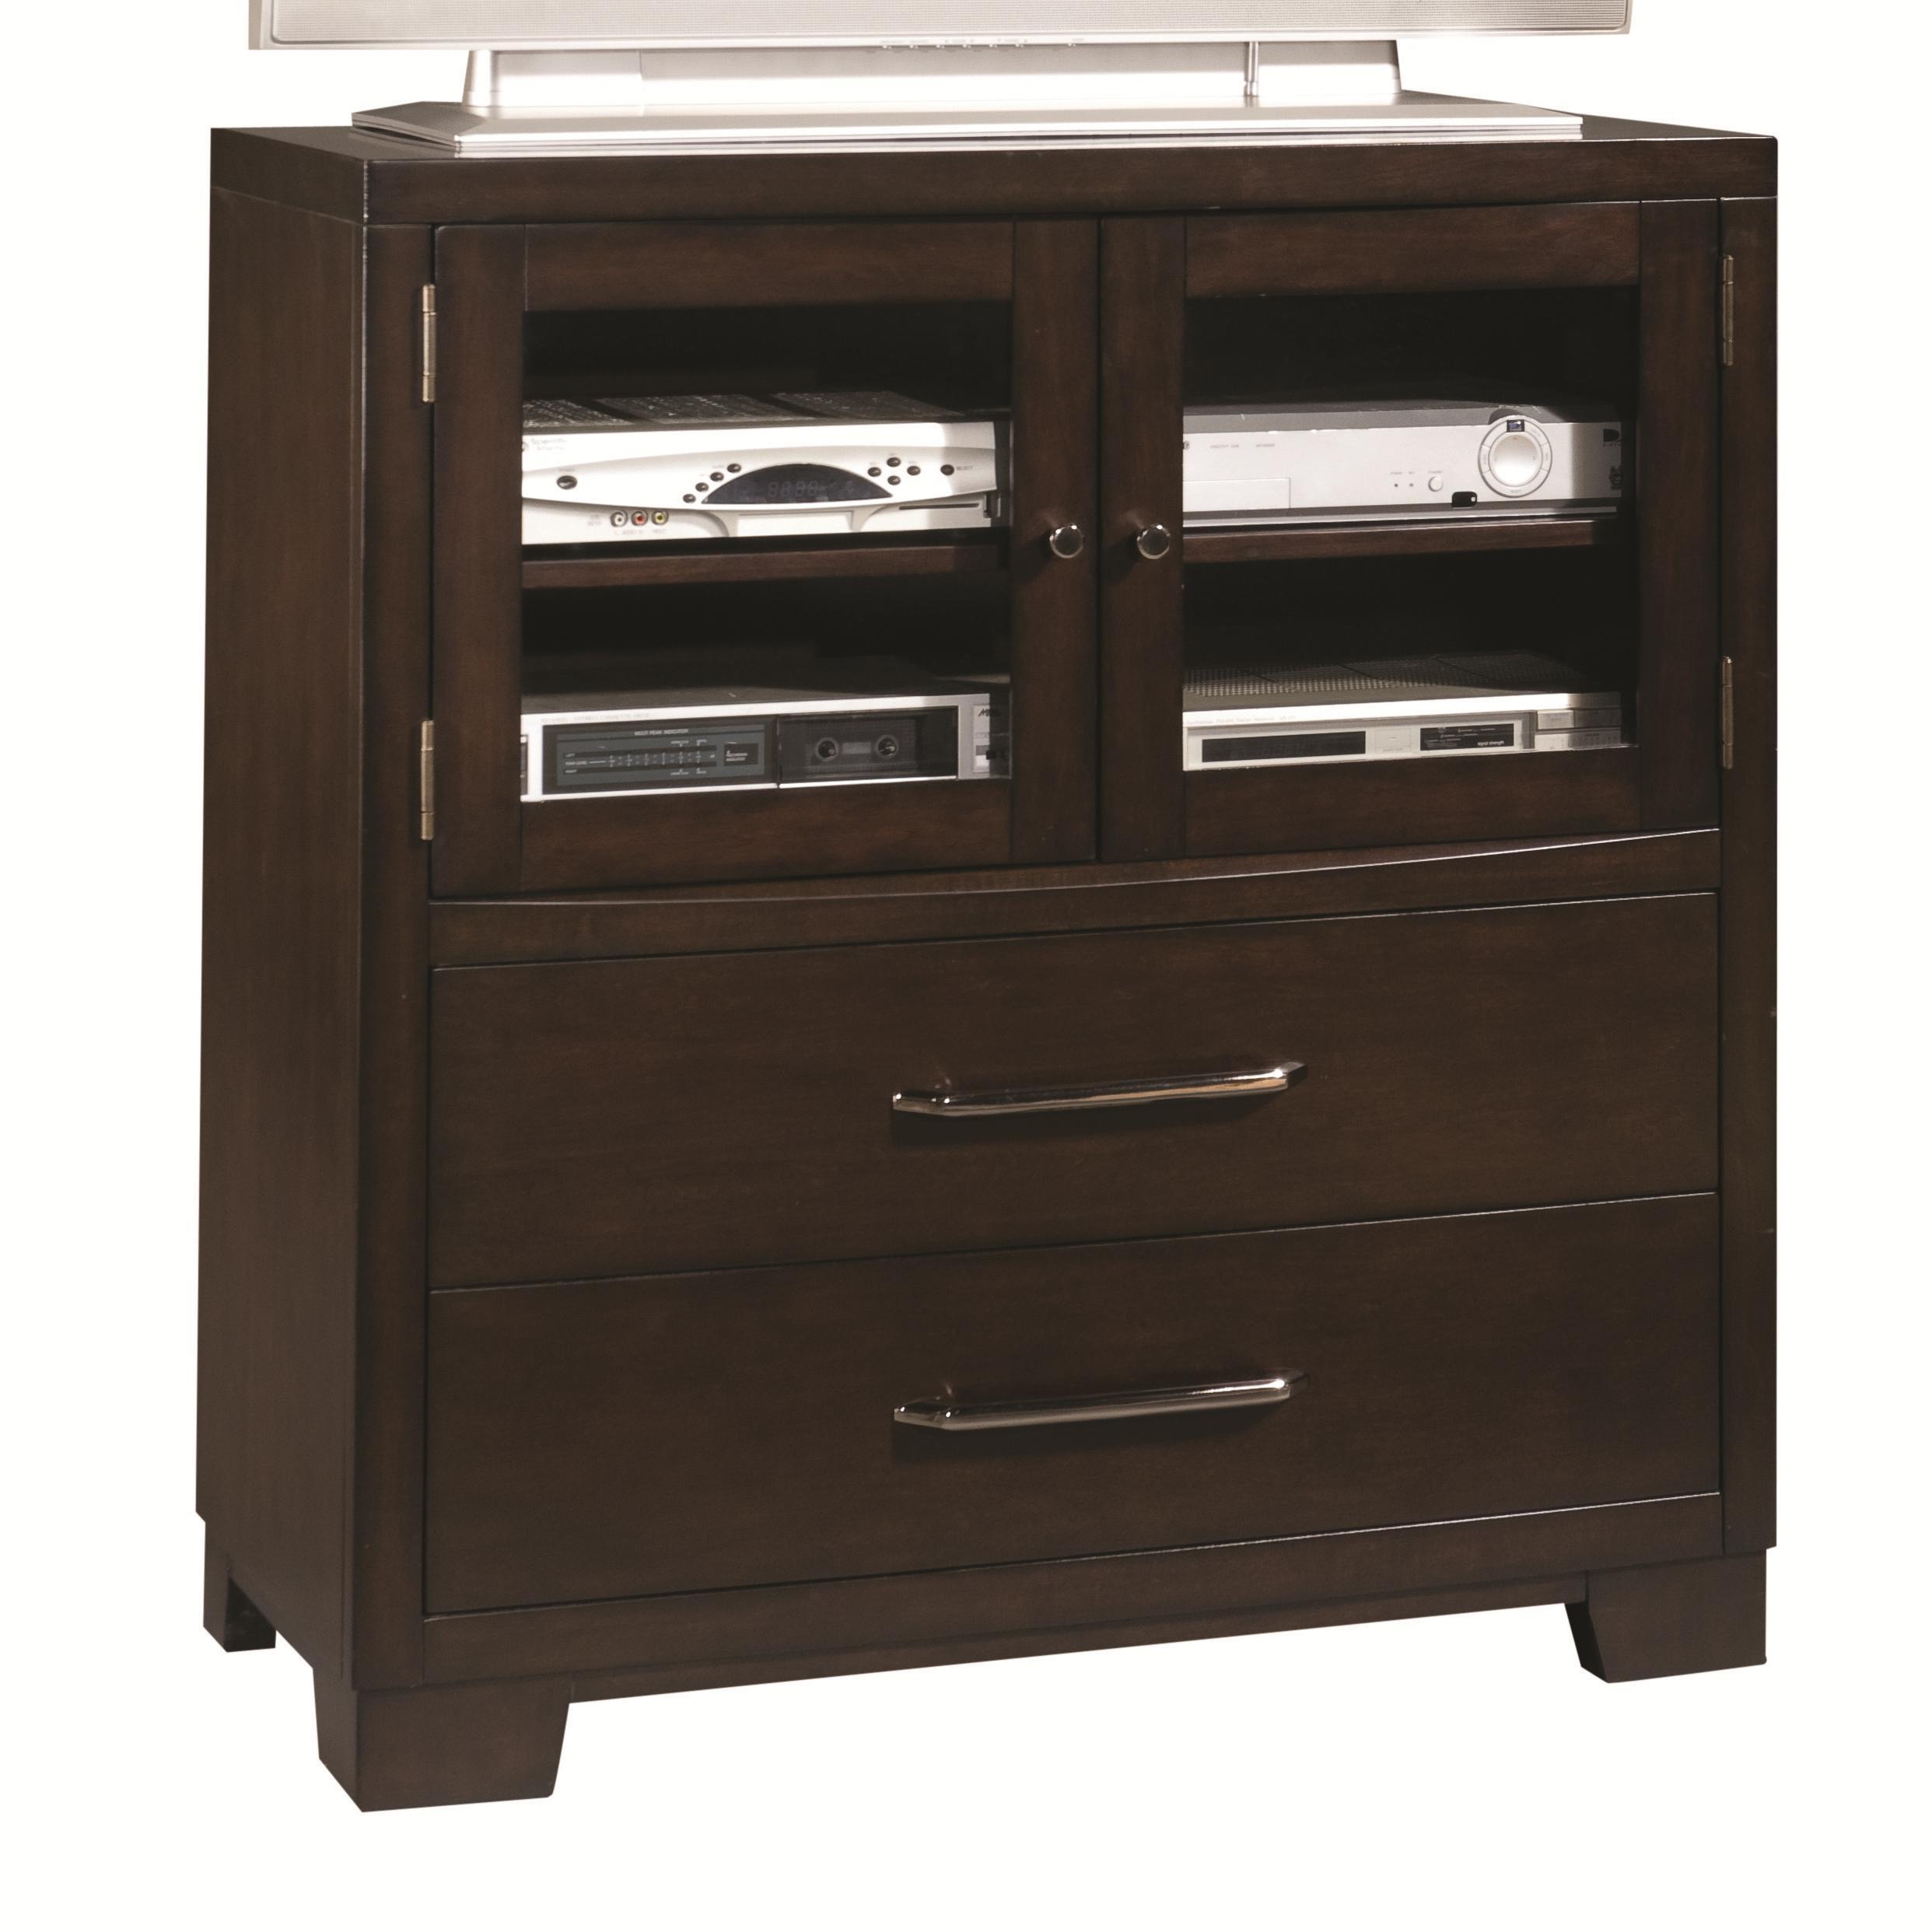 2 Door And 2 Drawer Media Chest Charleston, North Charleston, Walterboro,  Summerville Furniture Store   Dixie Furniture